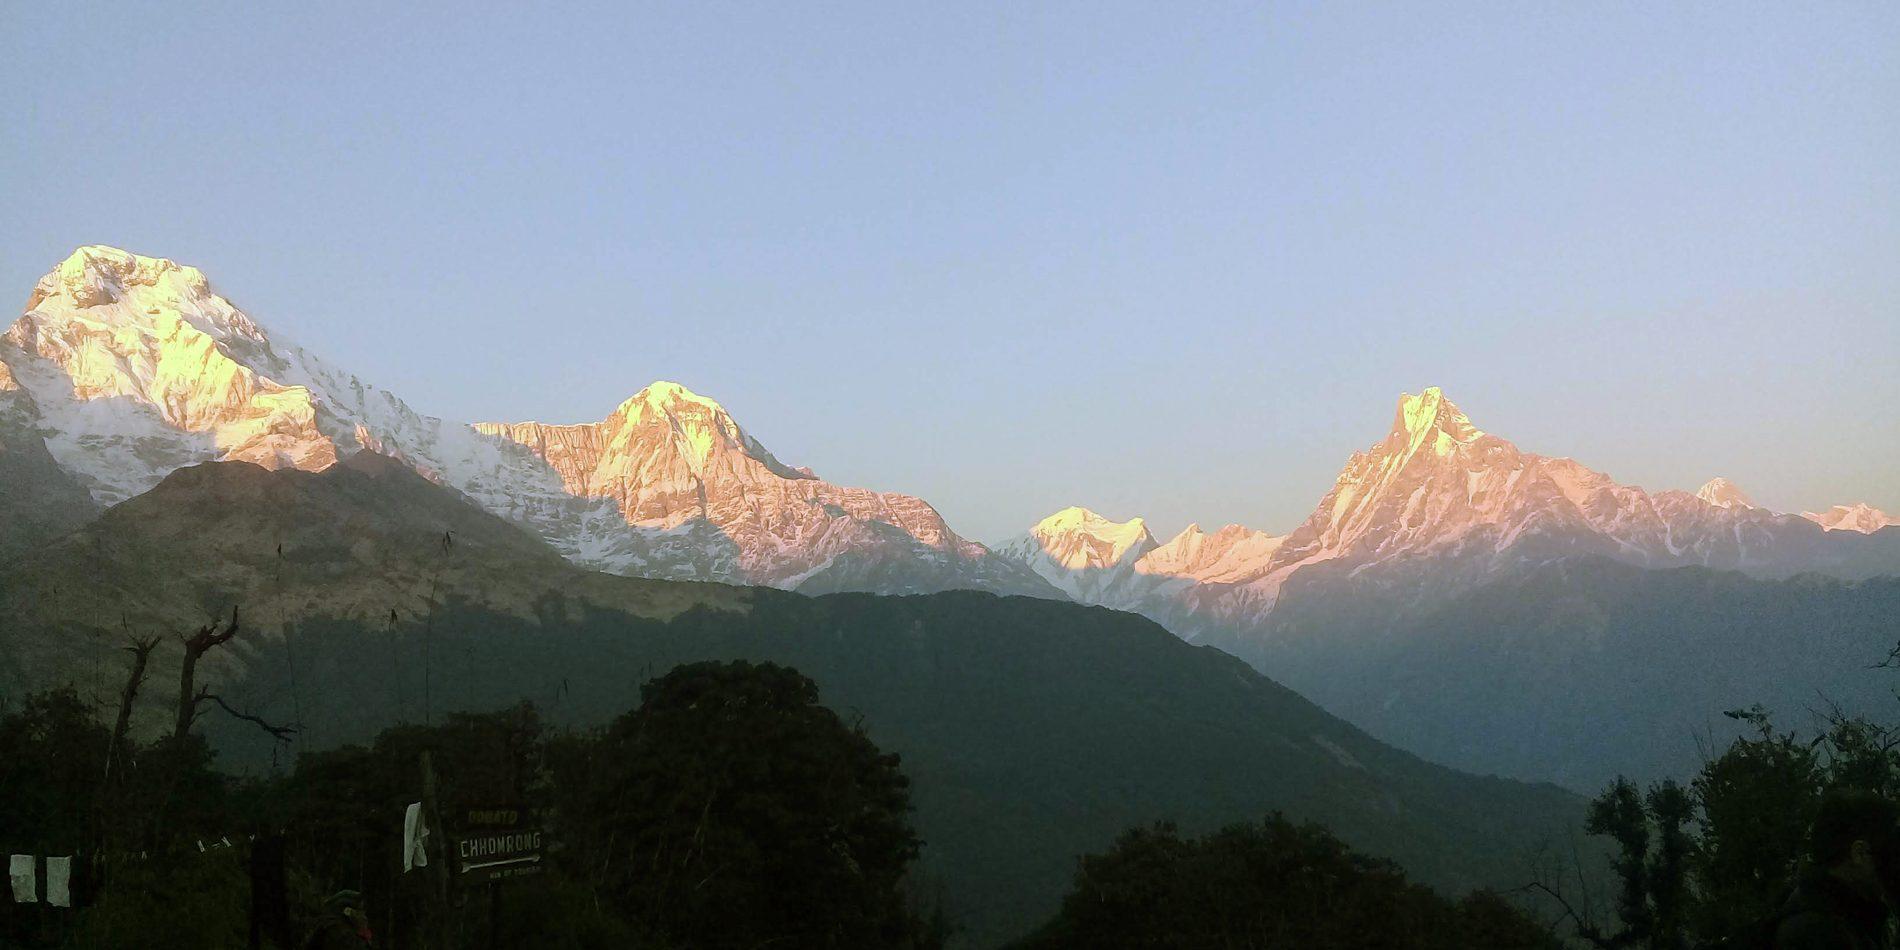 Annapurnas and Fishtail